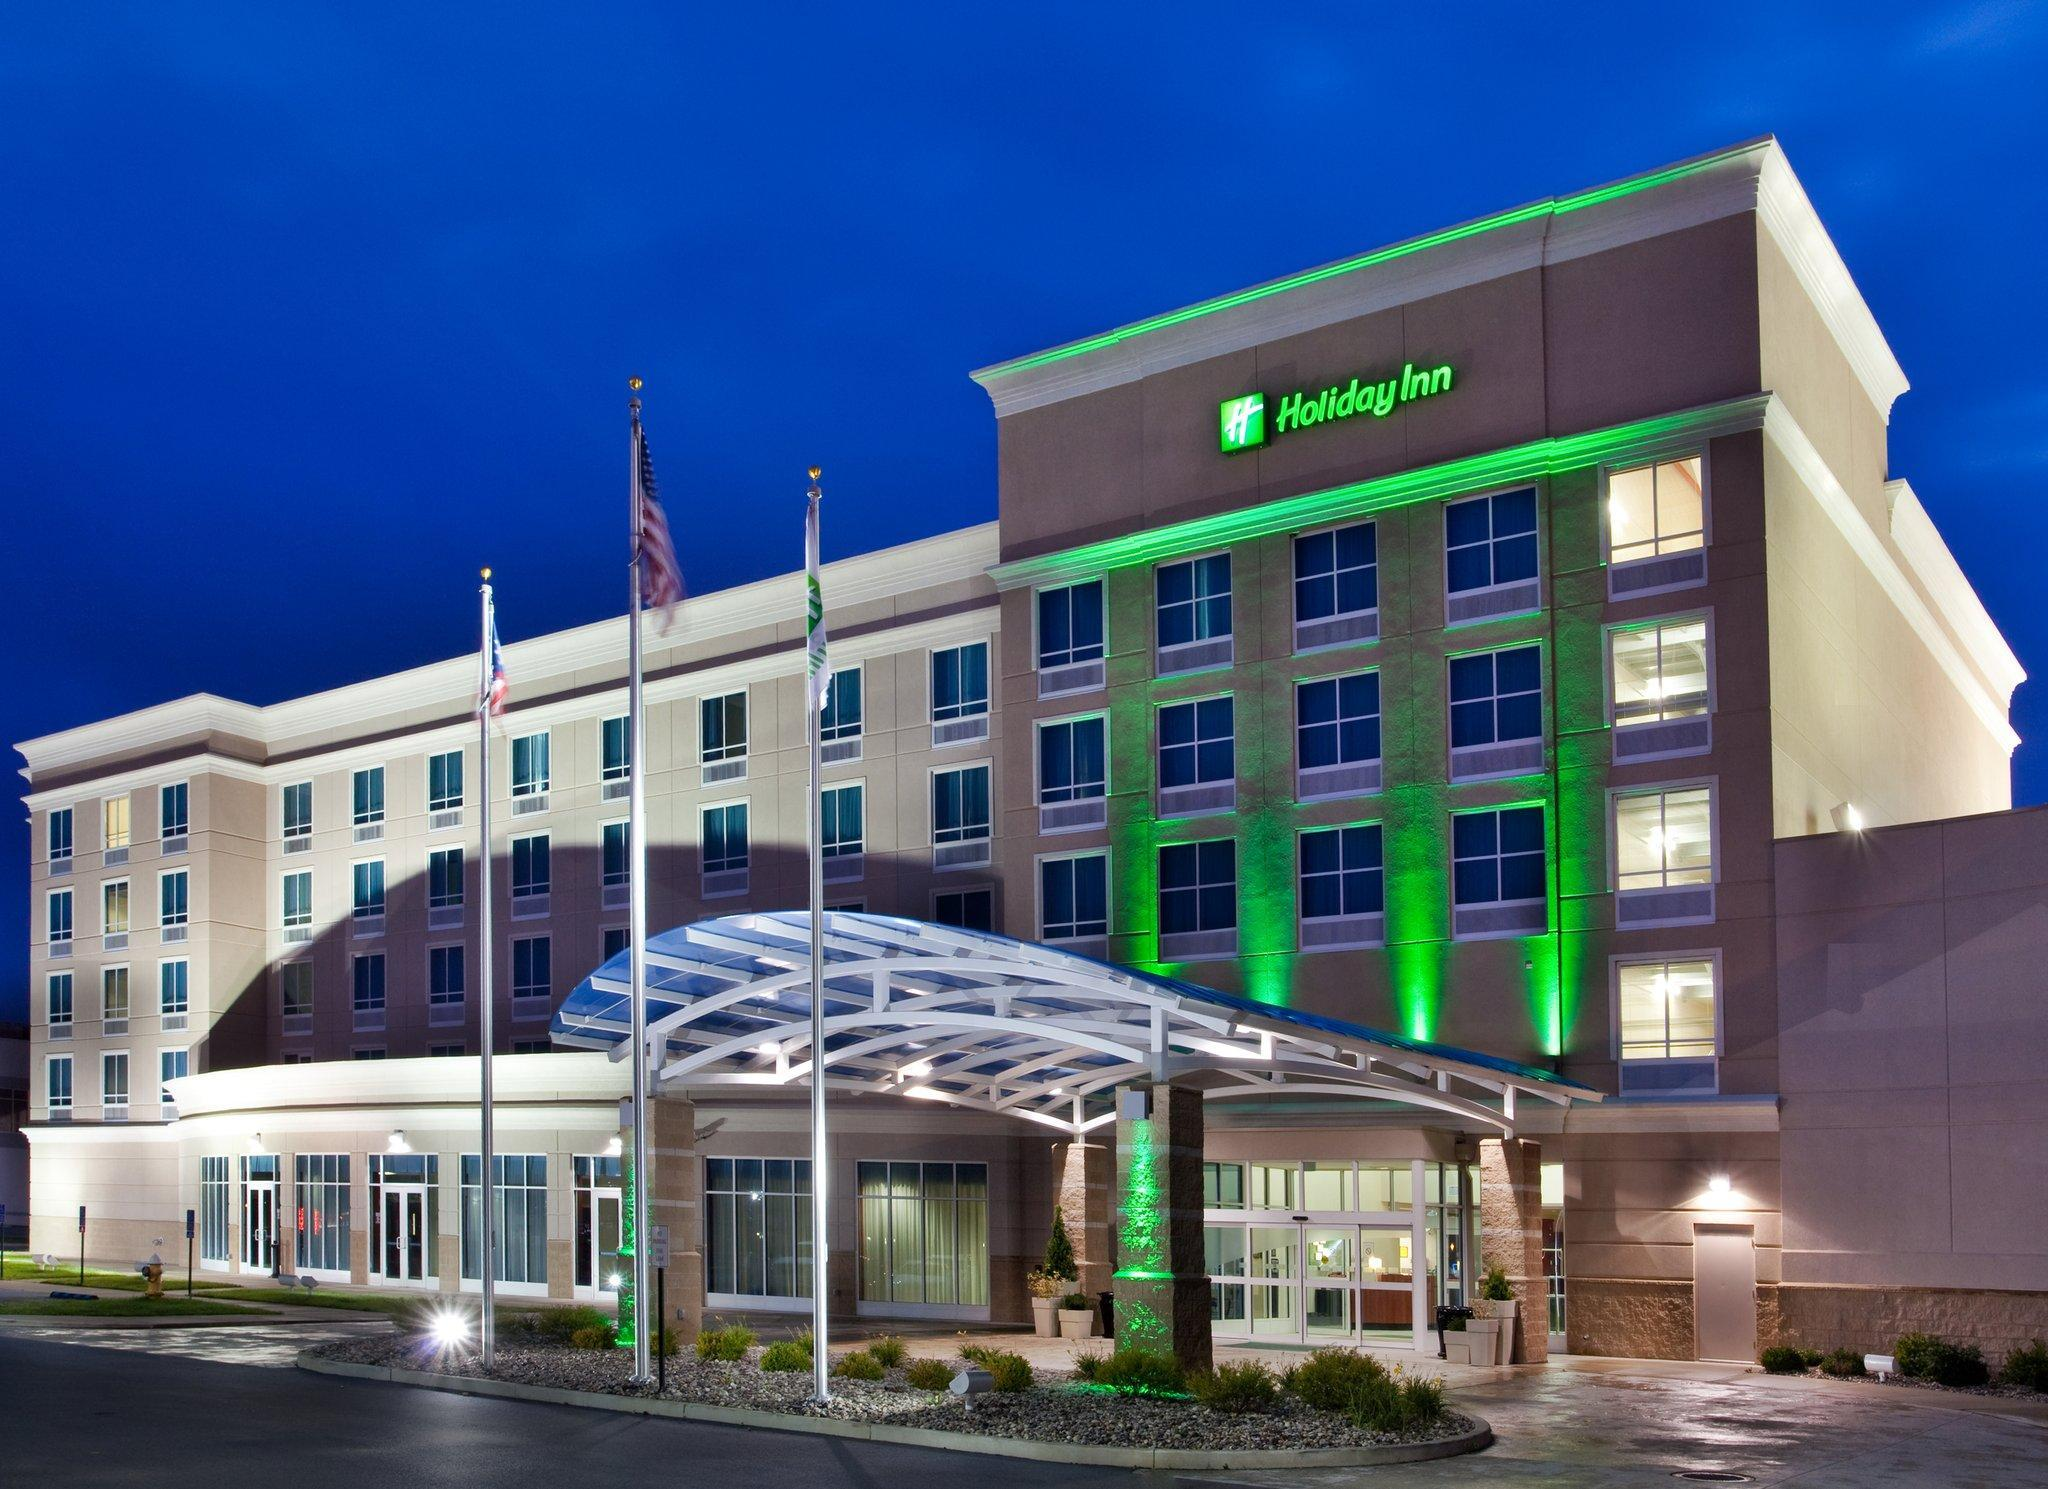 Holiday Inn Toledo   Maumee I 80 90